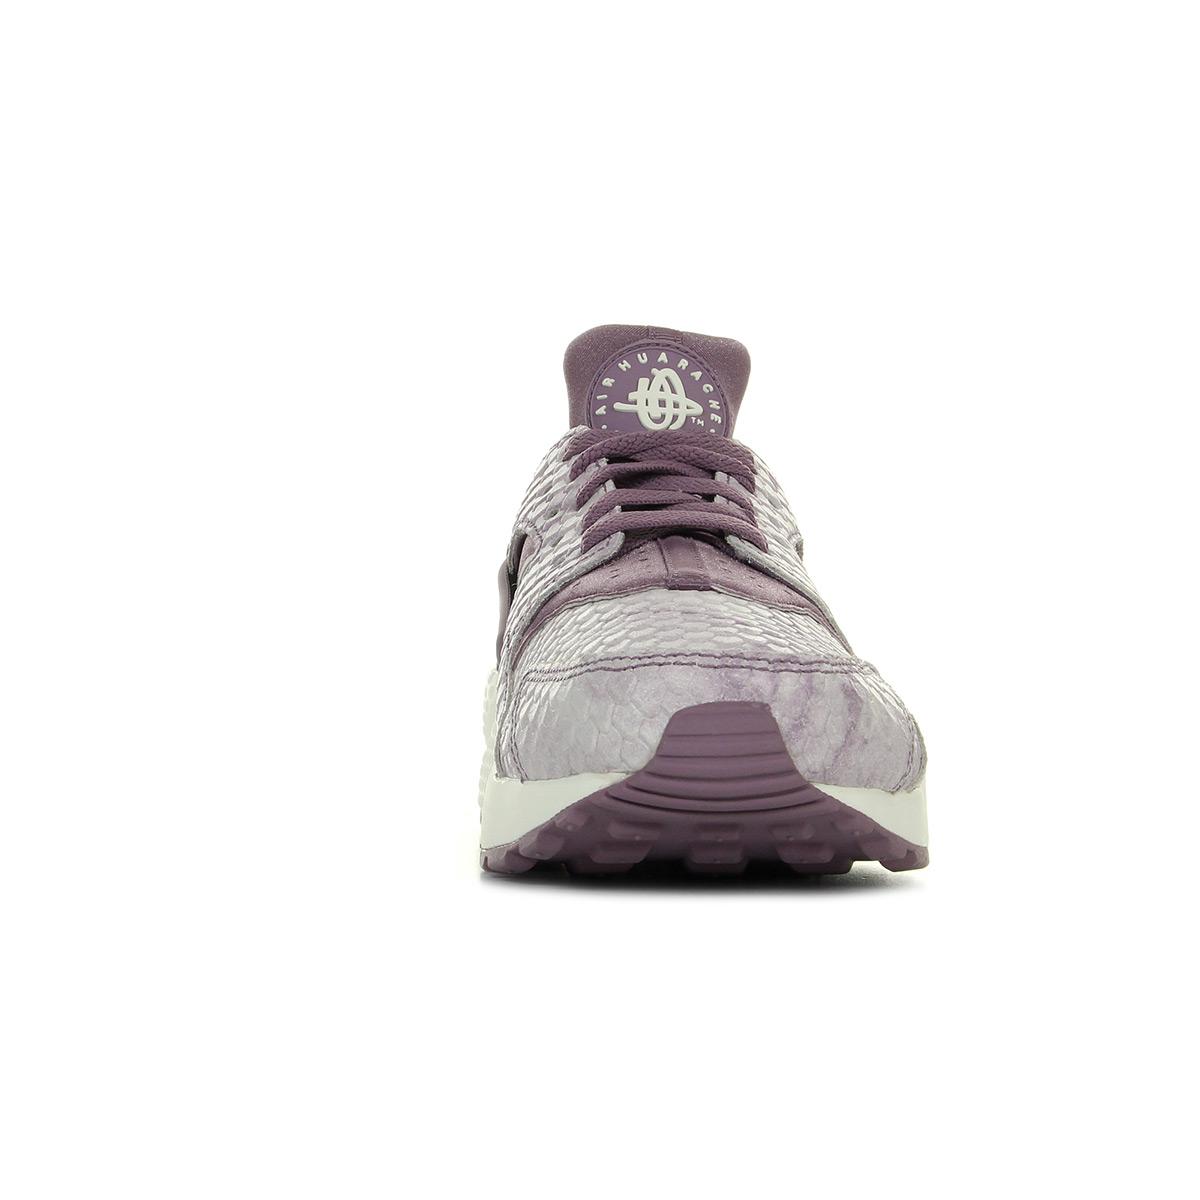 Nike Wmns Air Huarache Run PRM 683818500, Baskets mode femme